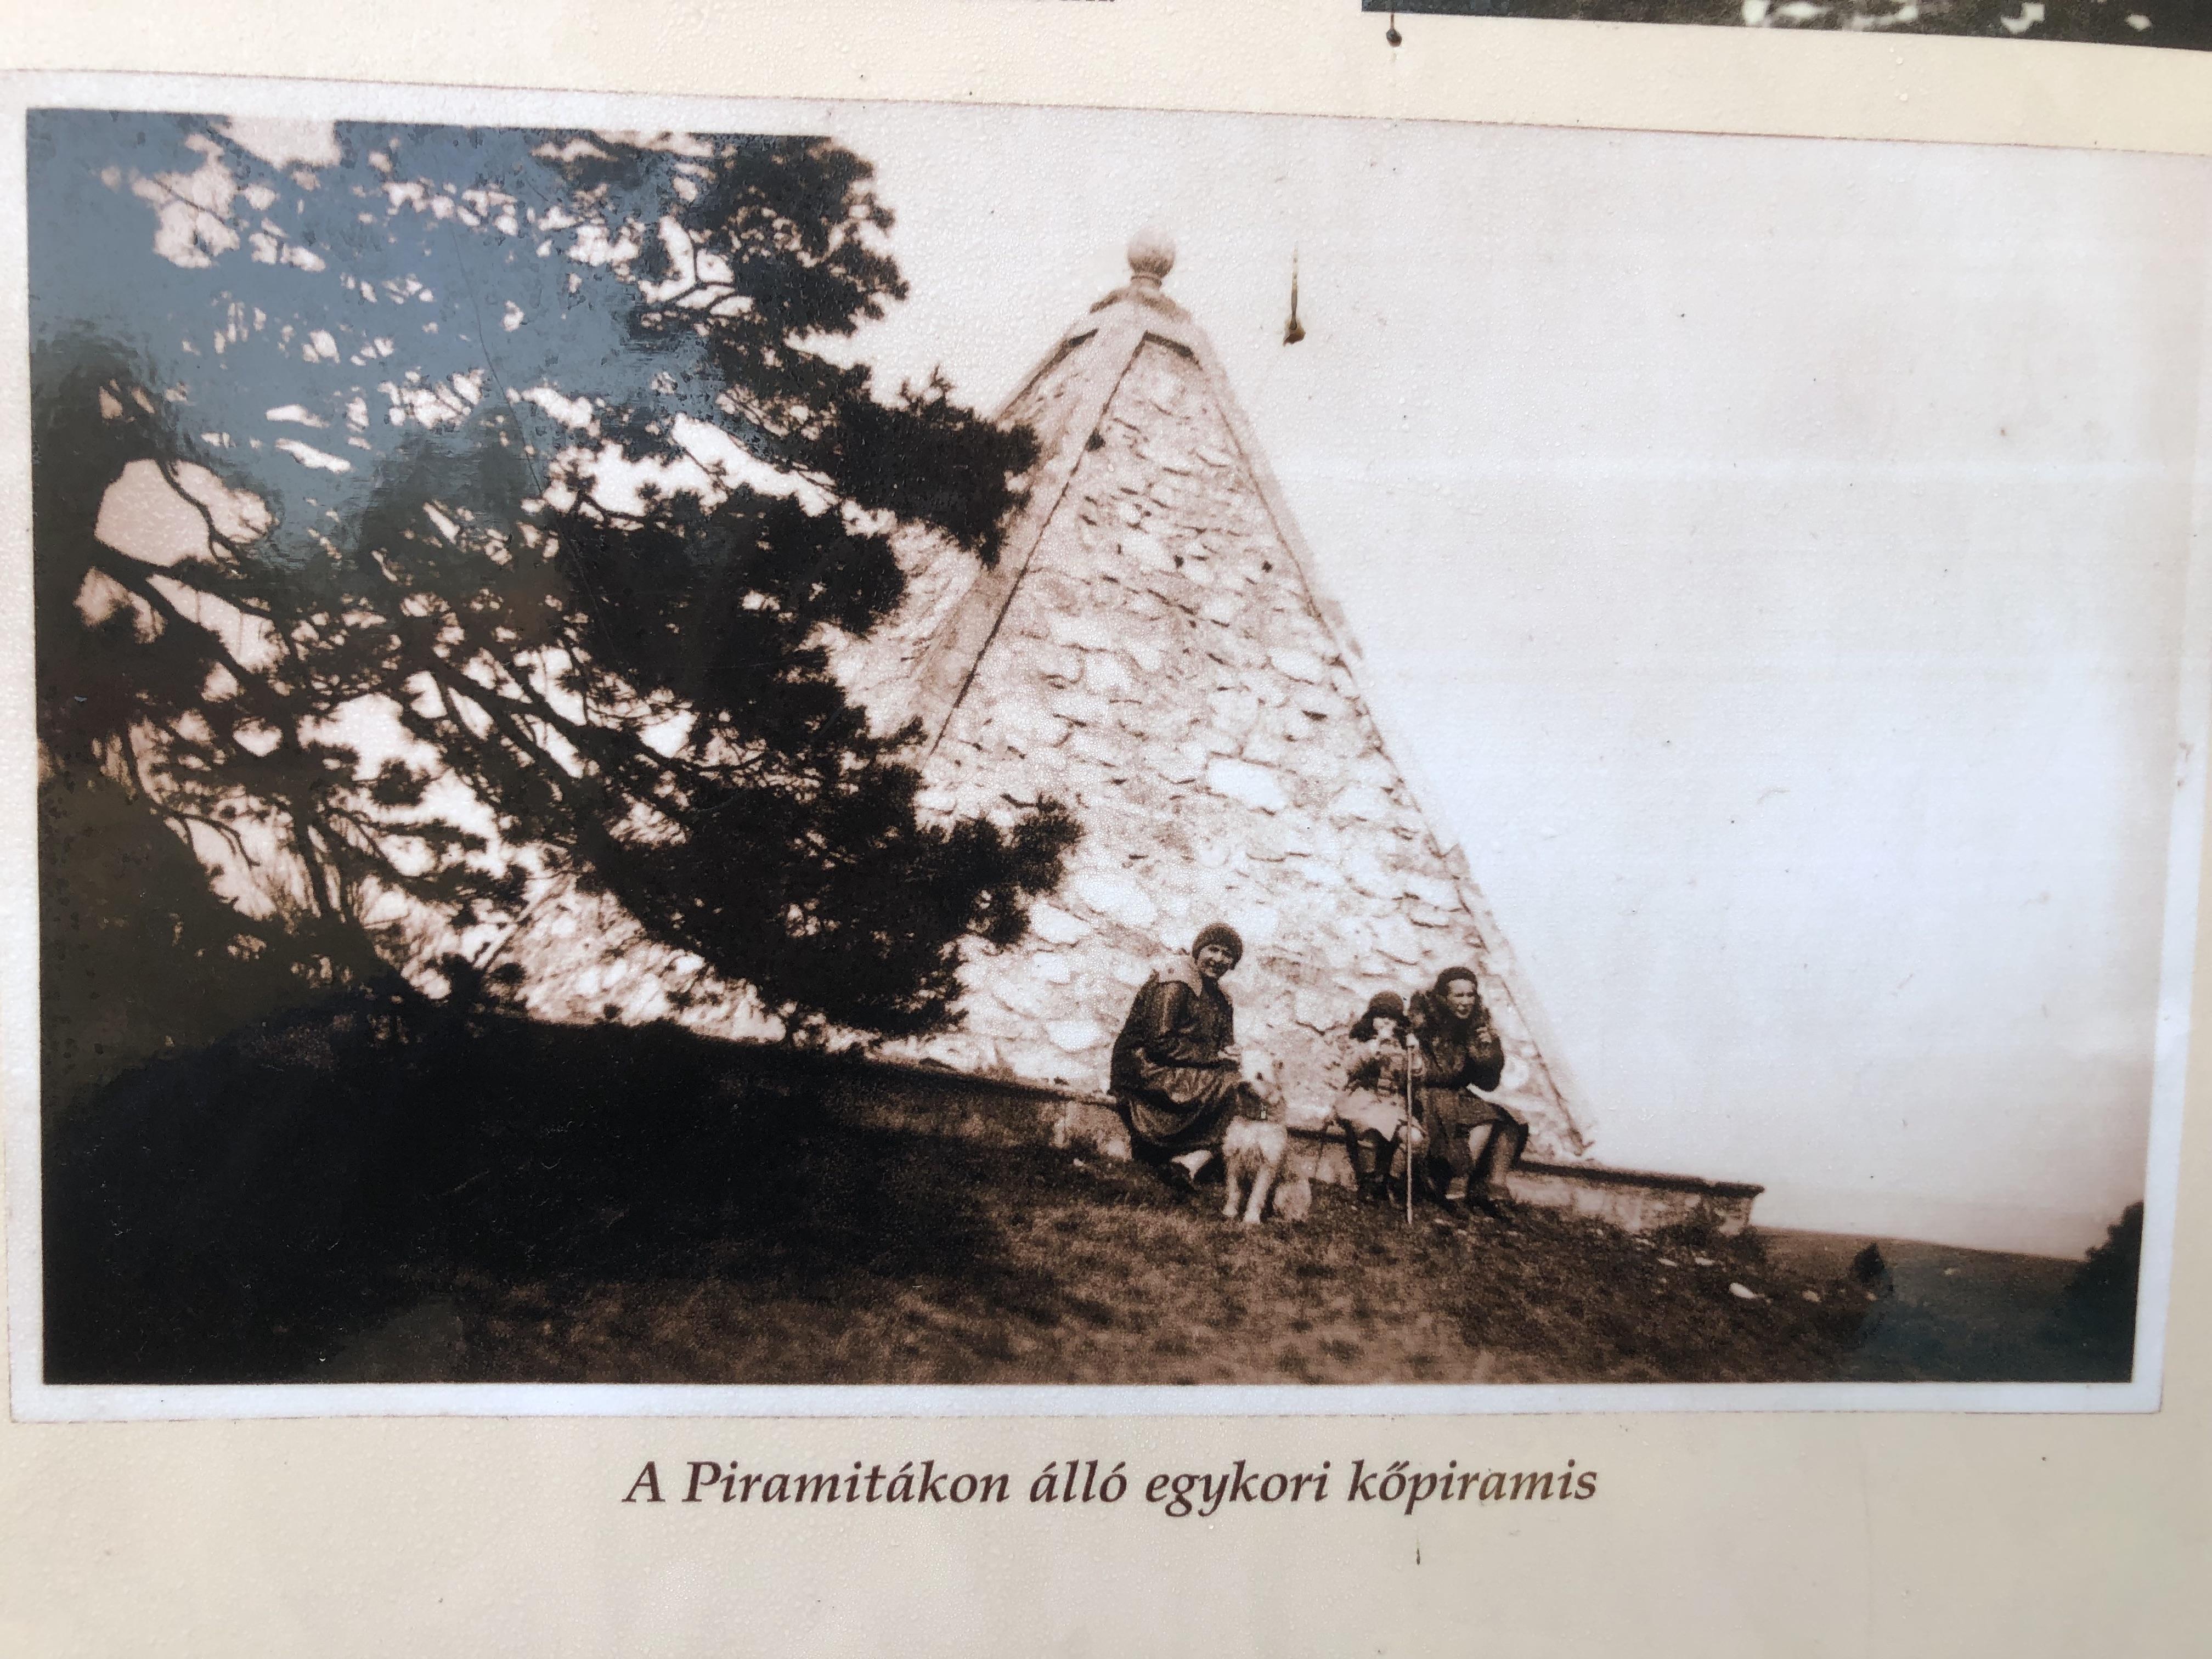 piramisregen.jpg